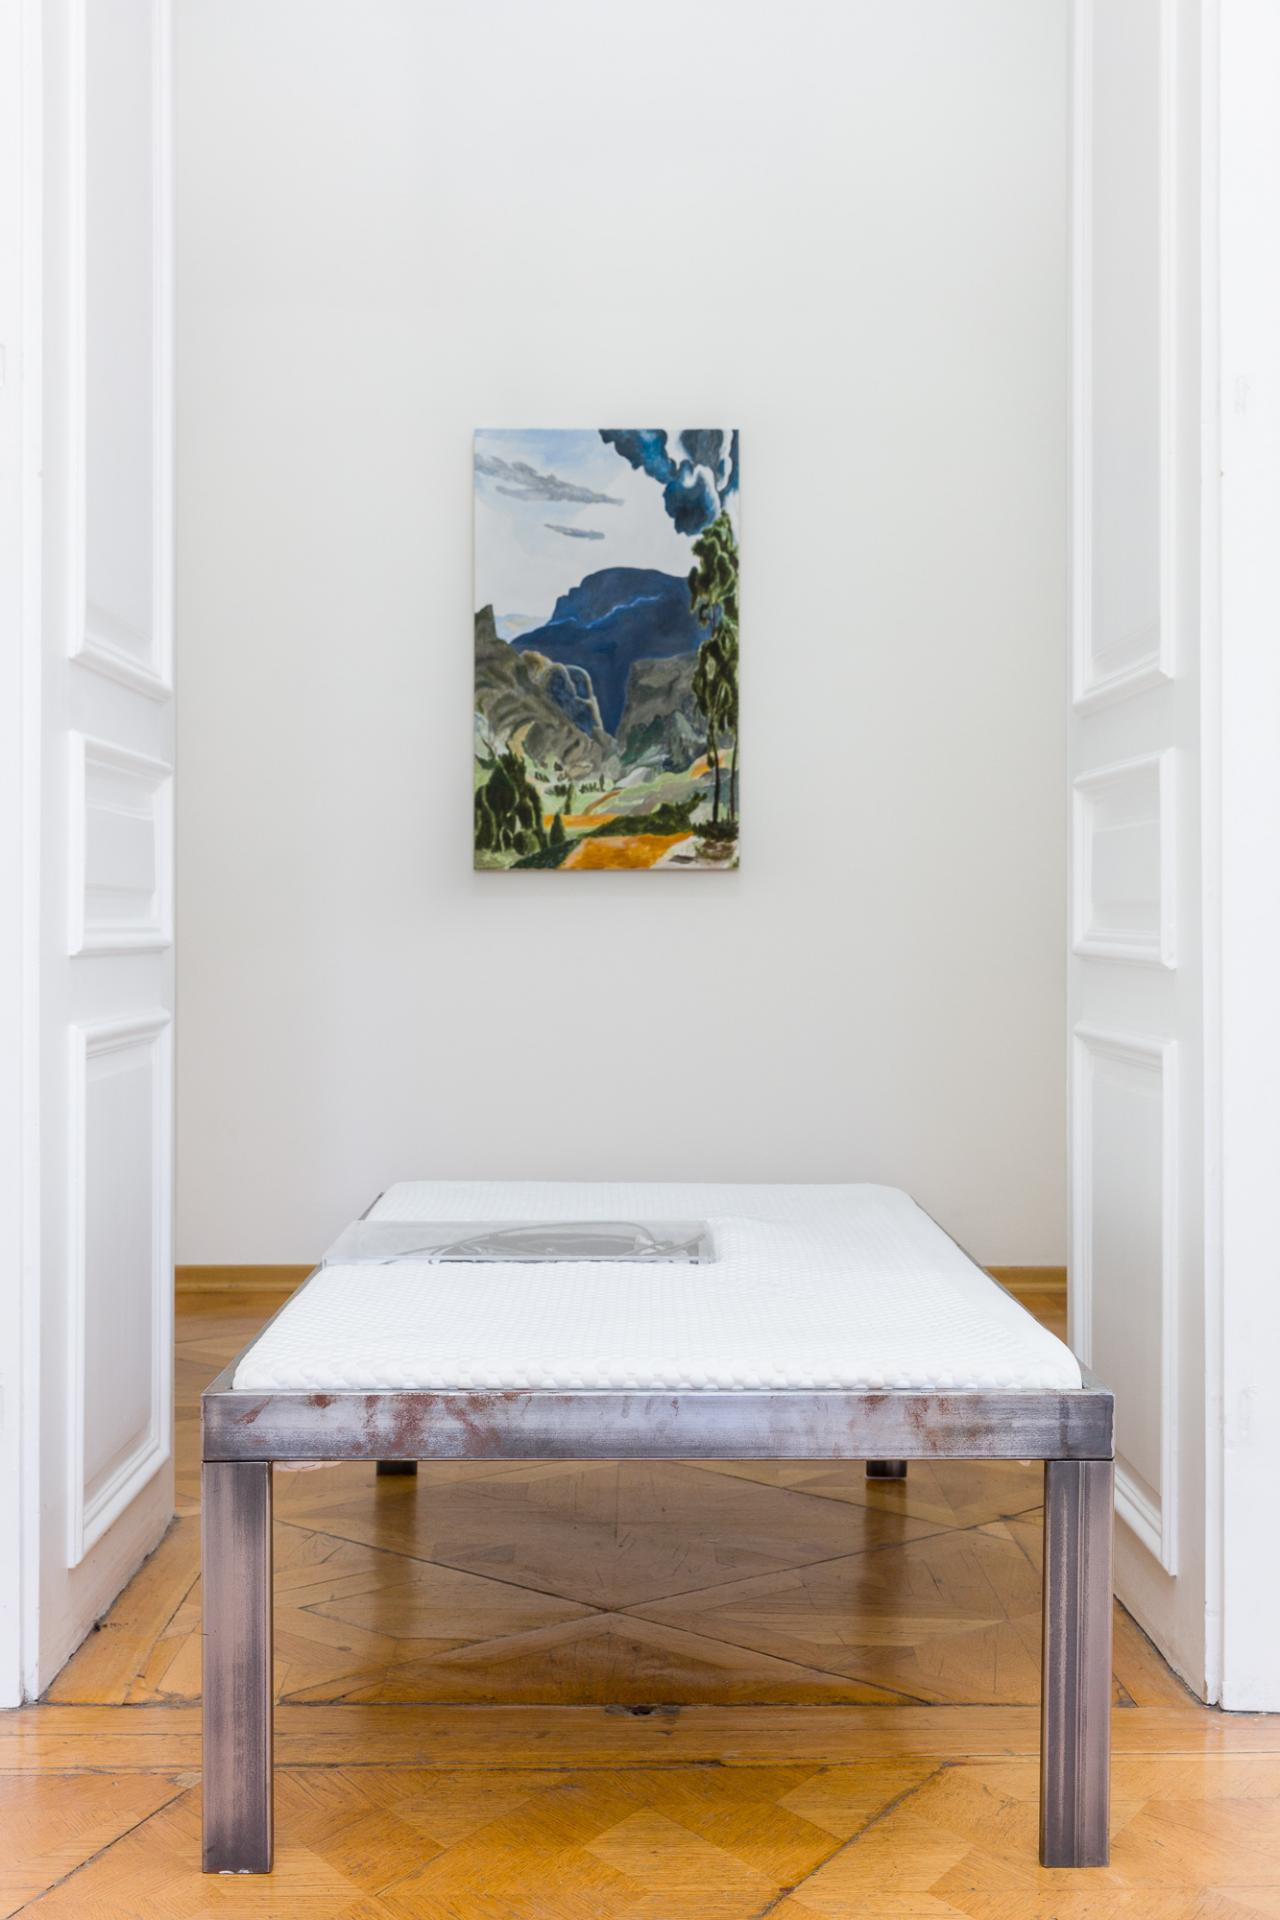 Dario Wokurka Meditating on Inheritable States II (2017) Fron: Marina Sula Faustidio (2018) Courtesy the artist and Croy Nielsen, Vienna;Photo: Kunst-dokumentation.com